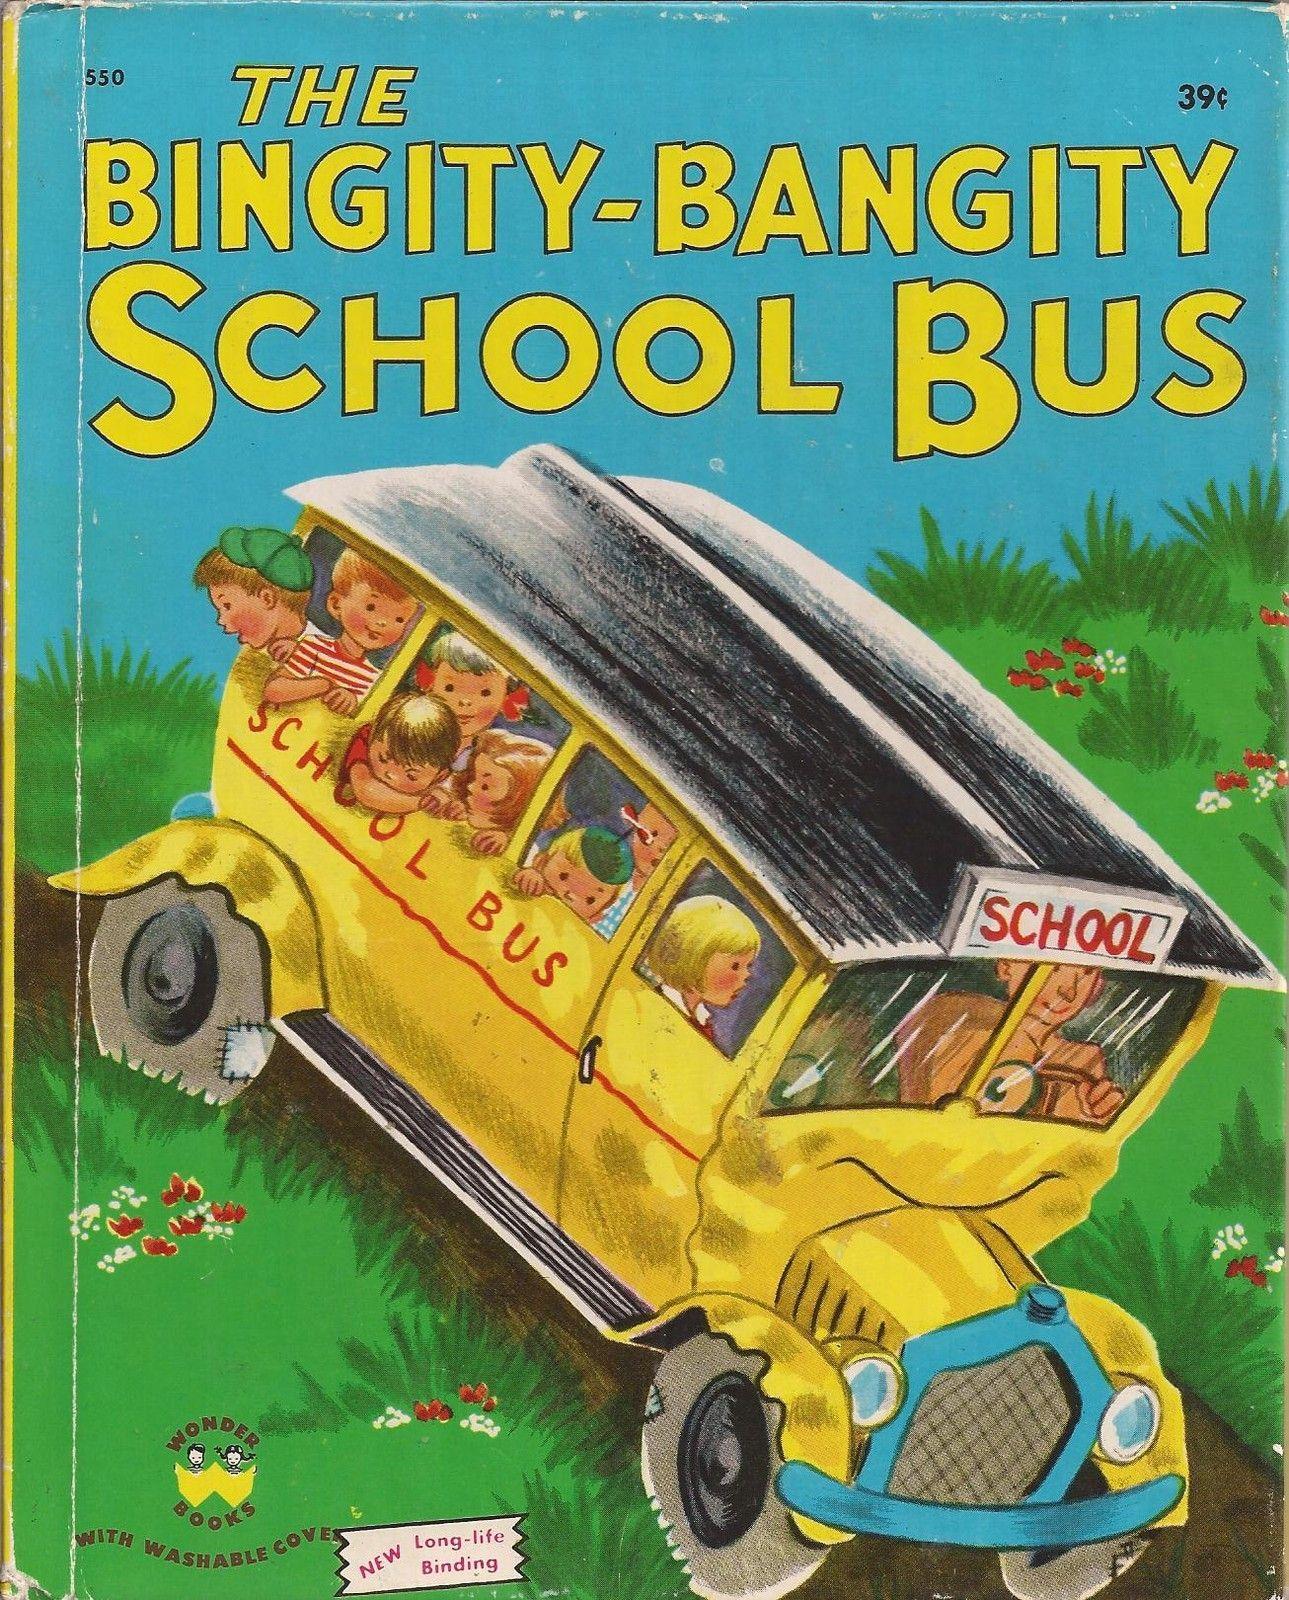 The bingitybangity school bus wonder book 1950 ebay